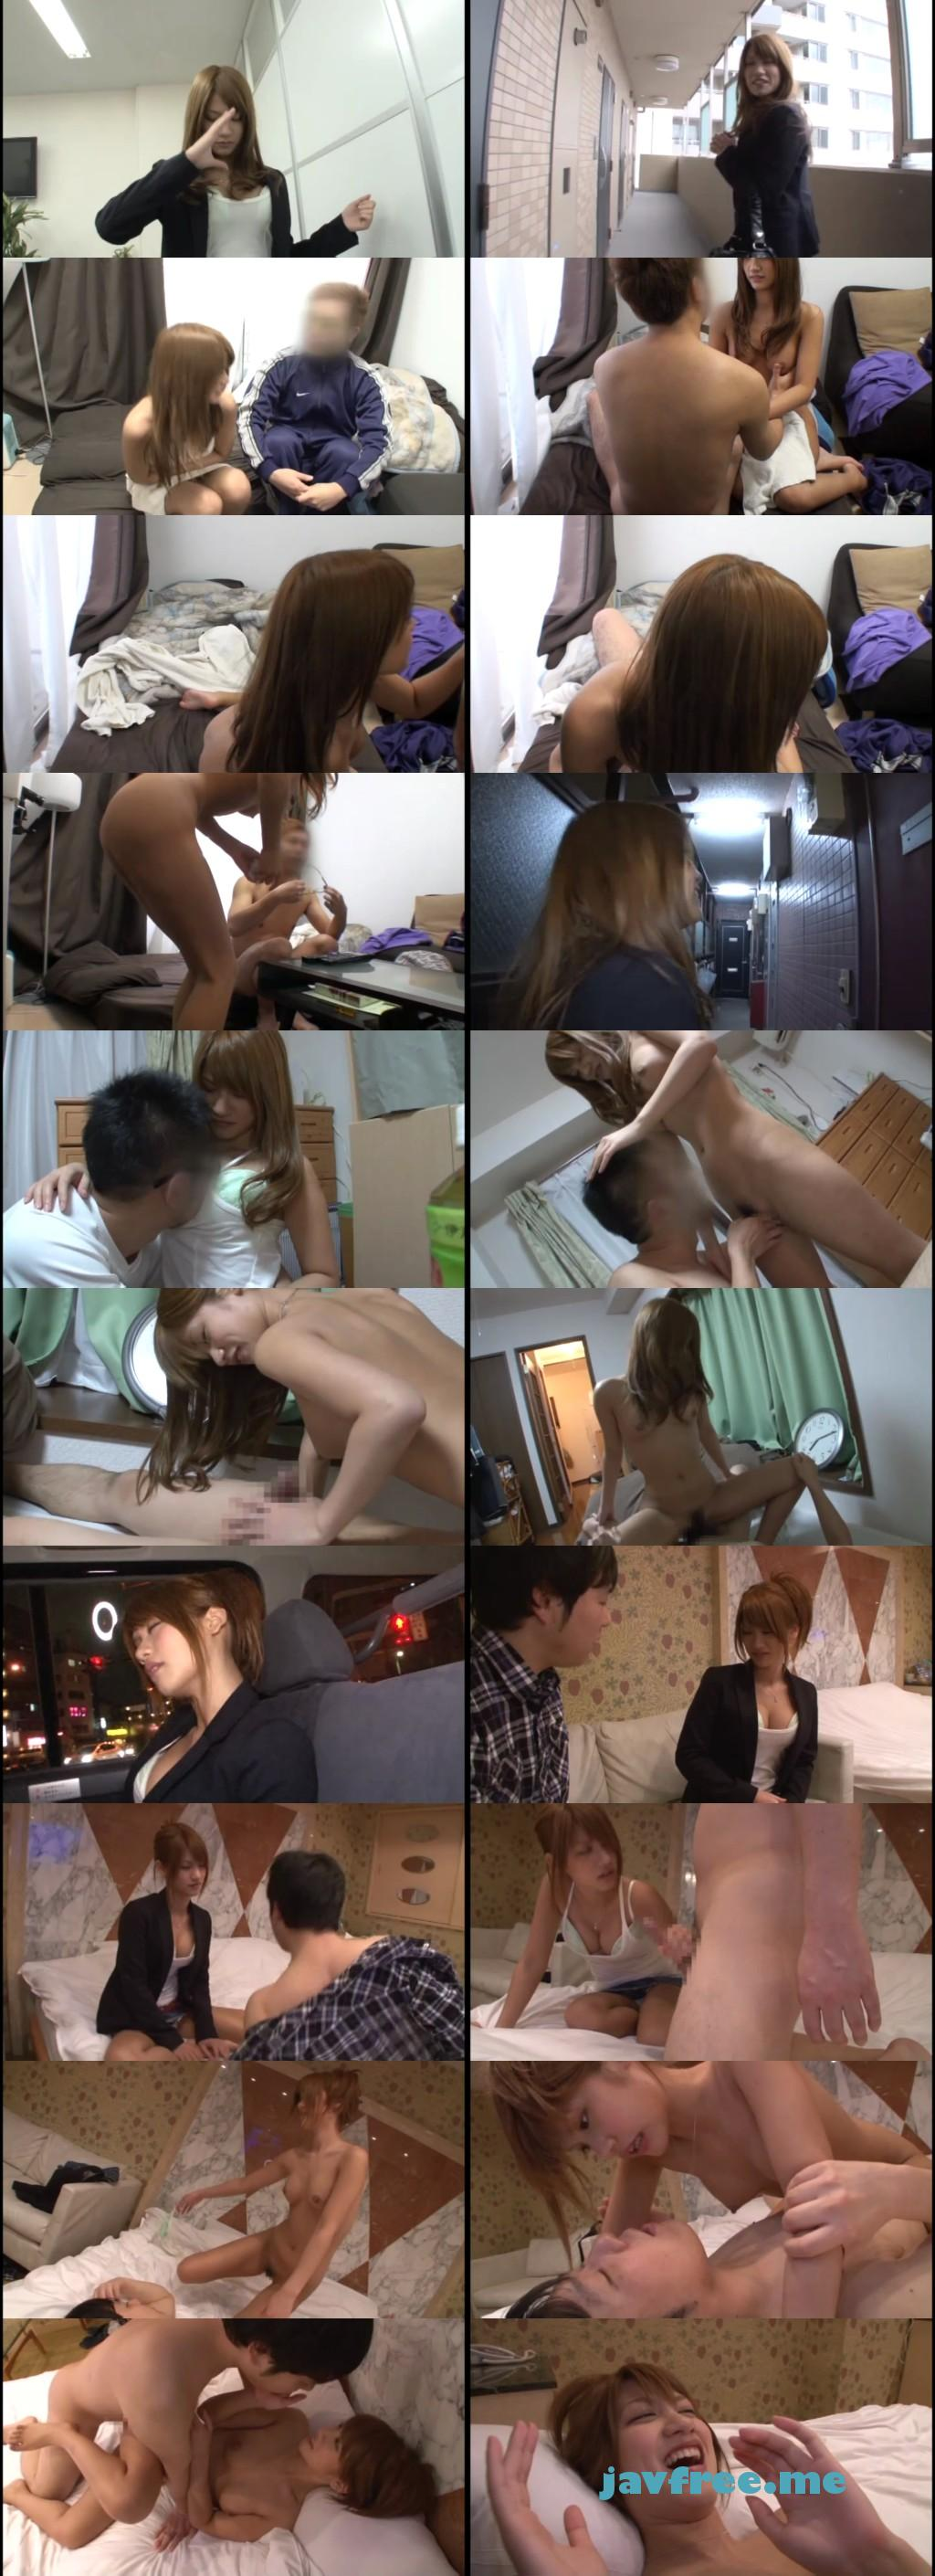 [MAS 075] 絶対的美少女、お貸しします。 ACT.19 絶対的美少女、お貸しします。 Nina MAS